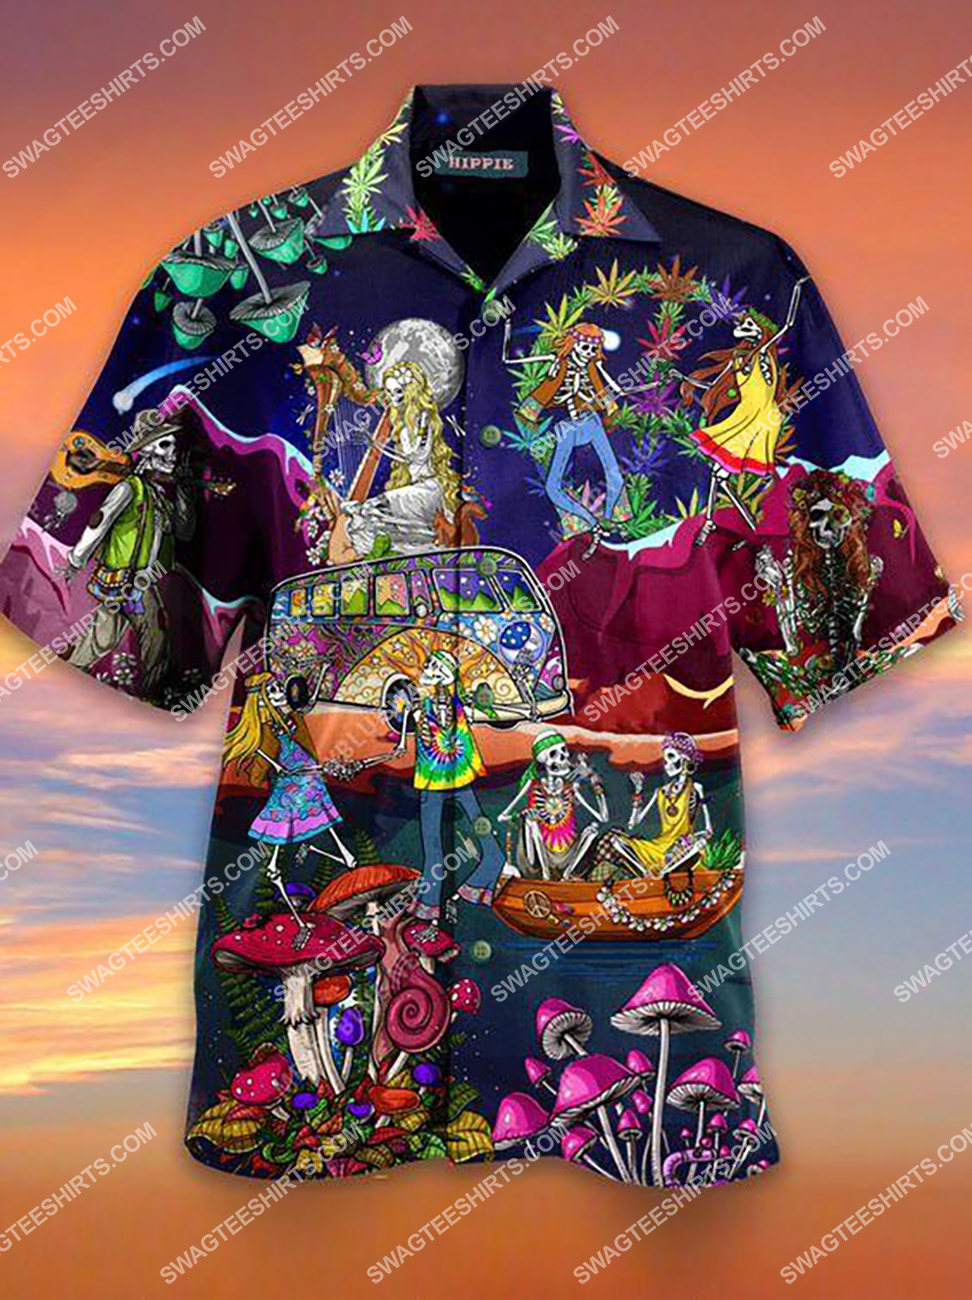 hippie lover skull all over printed hawaiian shirt 1(2) - Copy